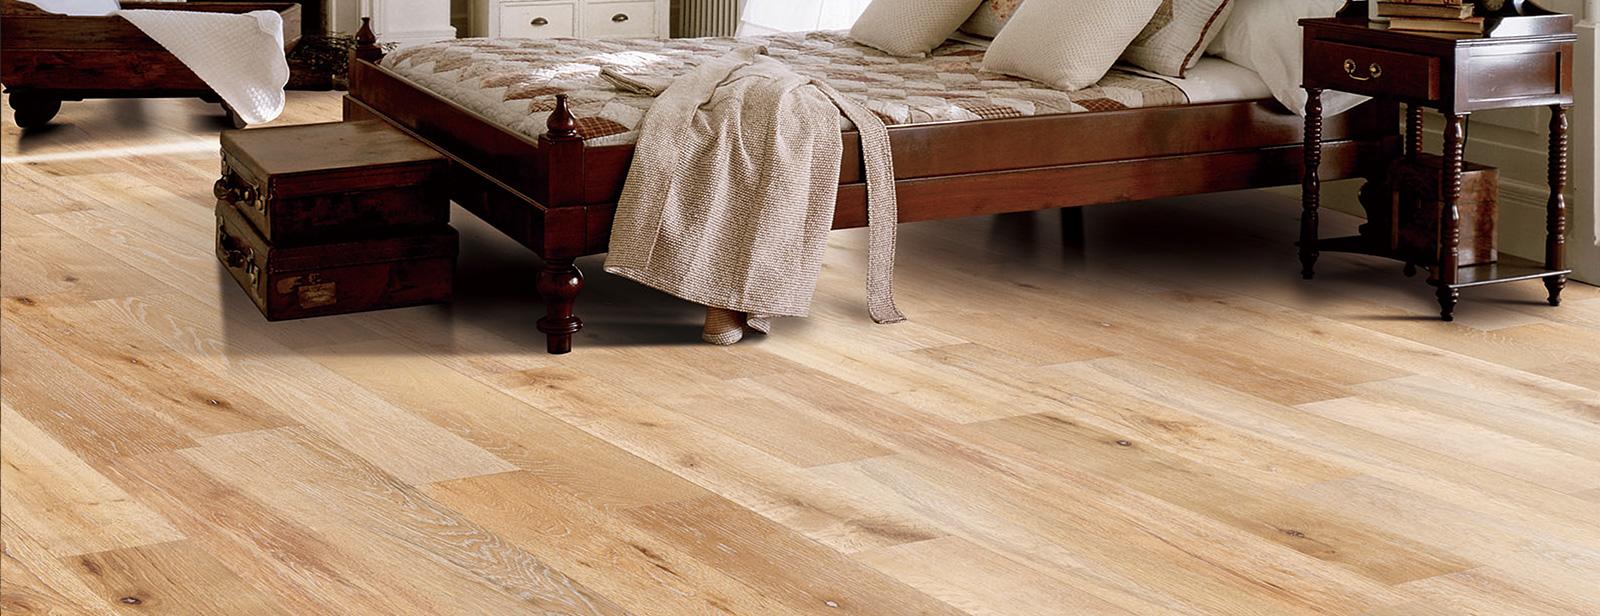 affordable installed com repair hardwood ny flooring refinish floors ct